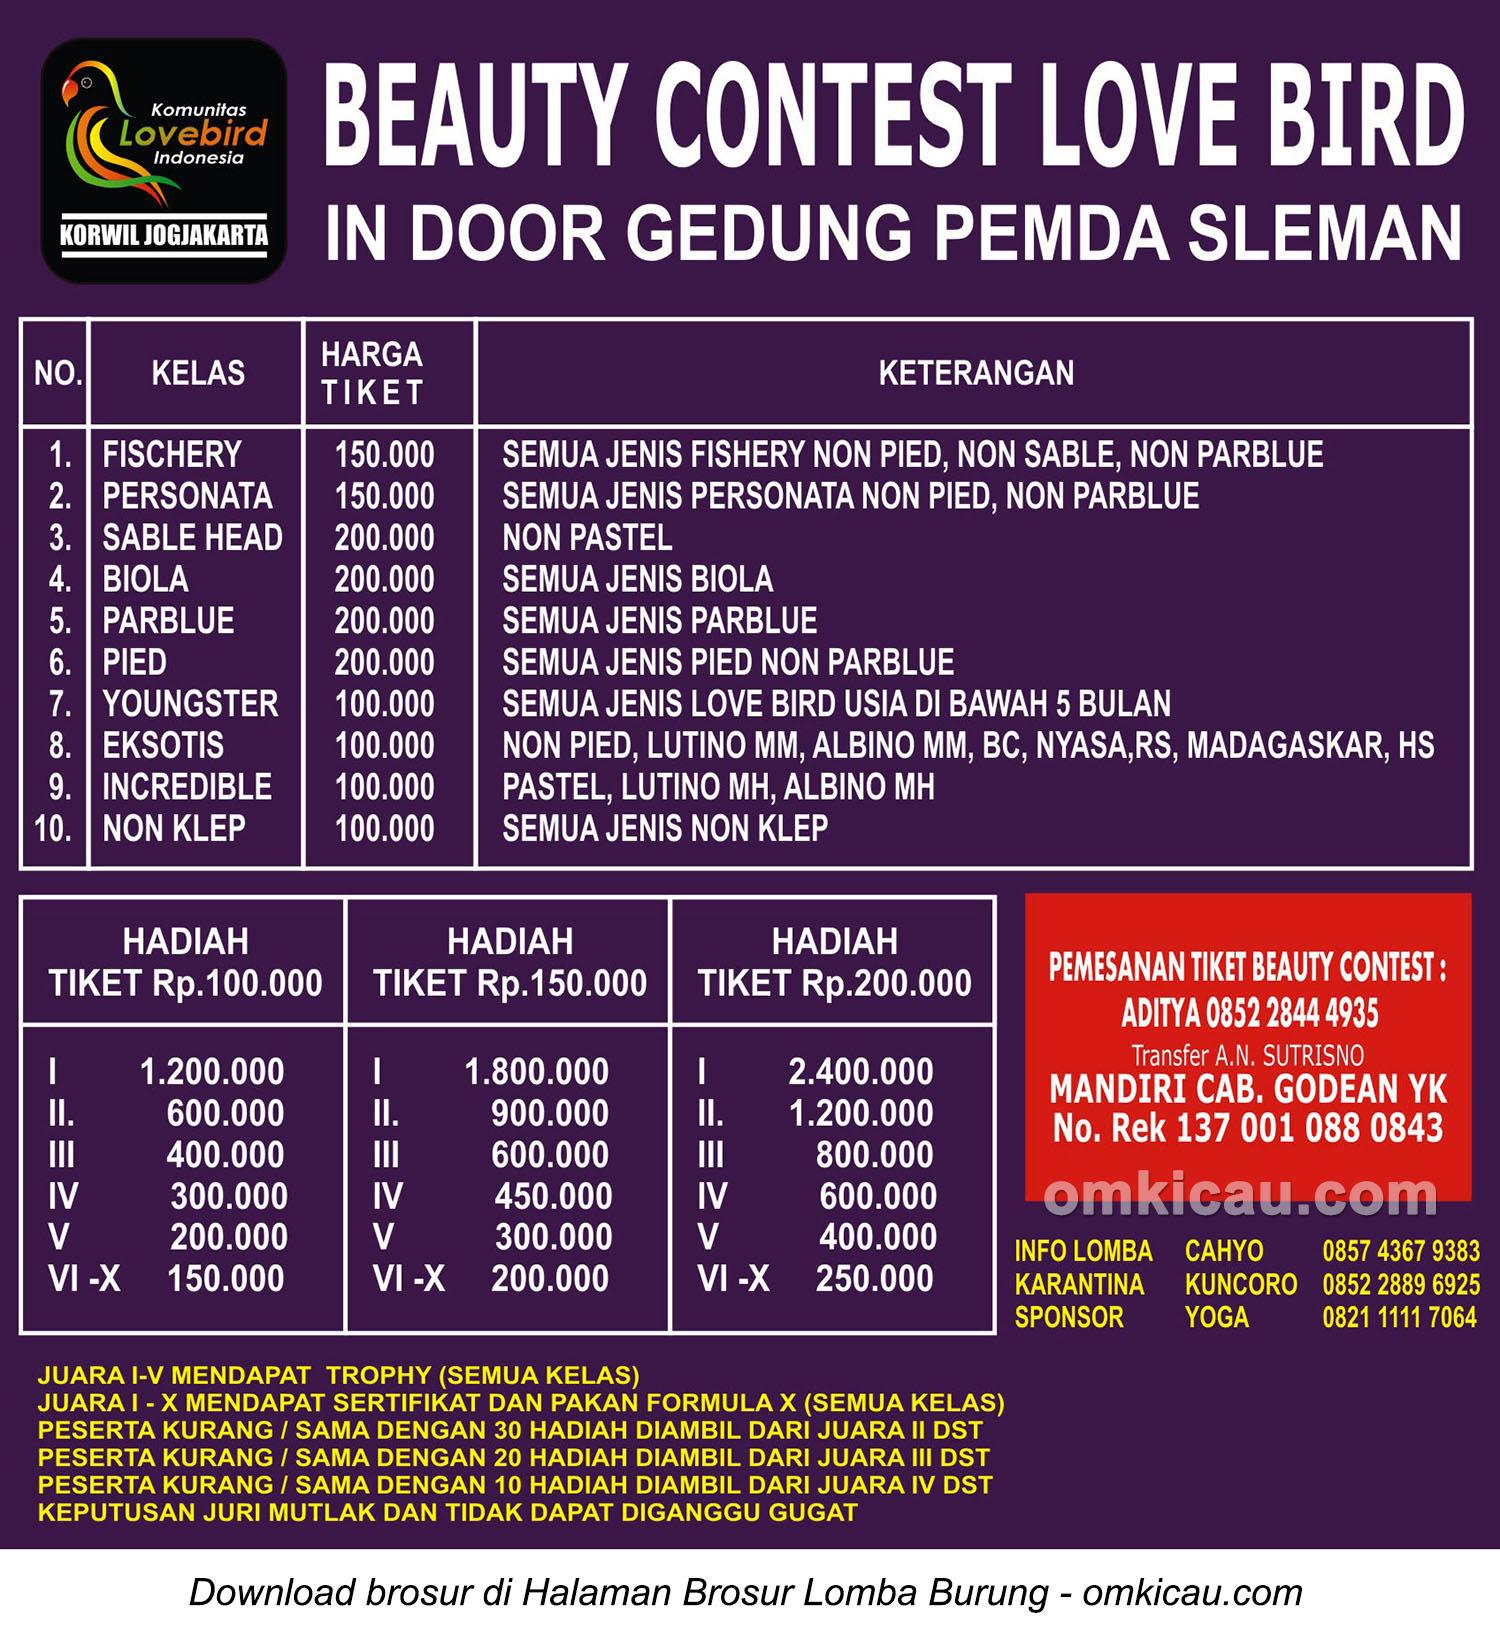 Brosur Lovebird Beauty Contest pada even Valentine Day PBI, Jogja, 14 Februari 2016